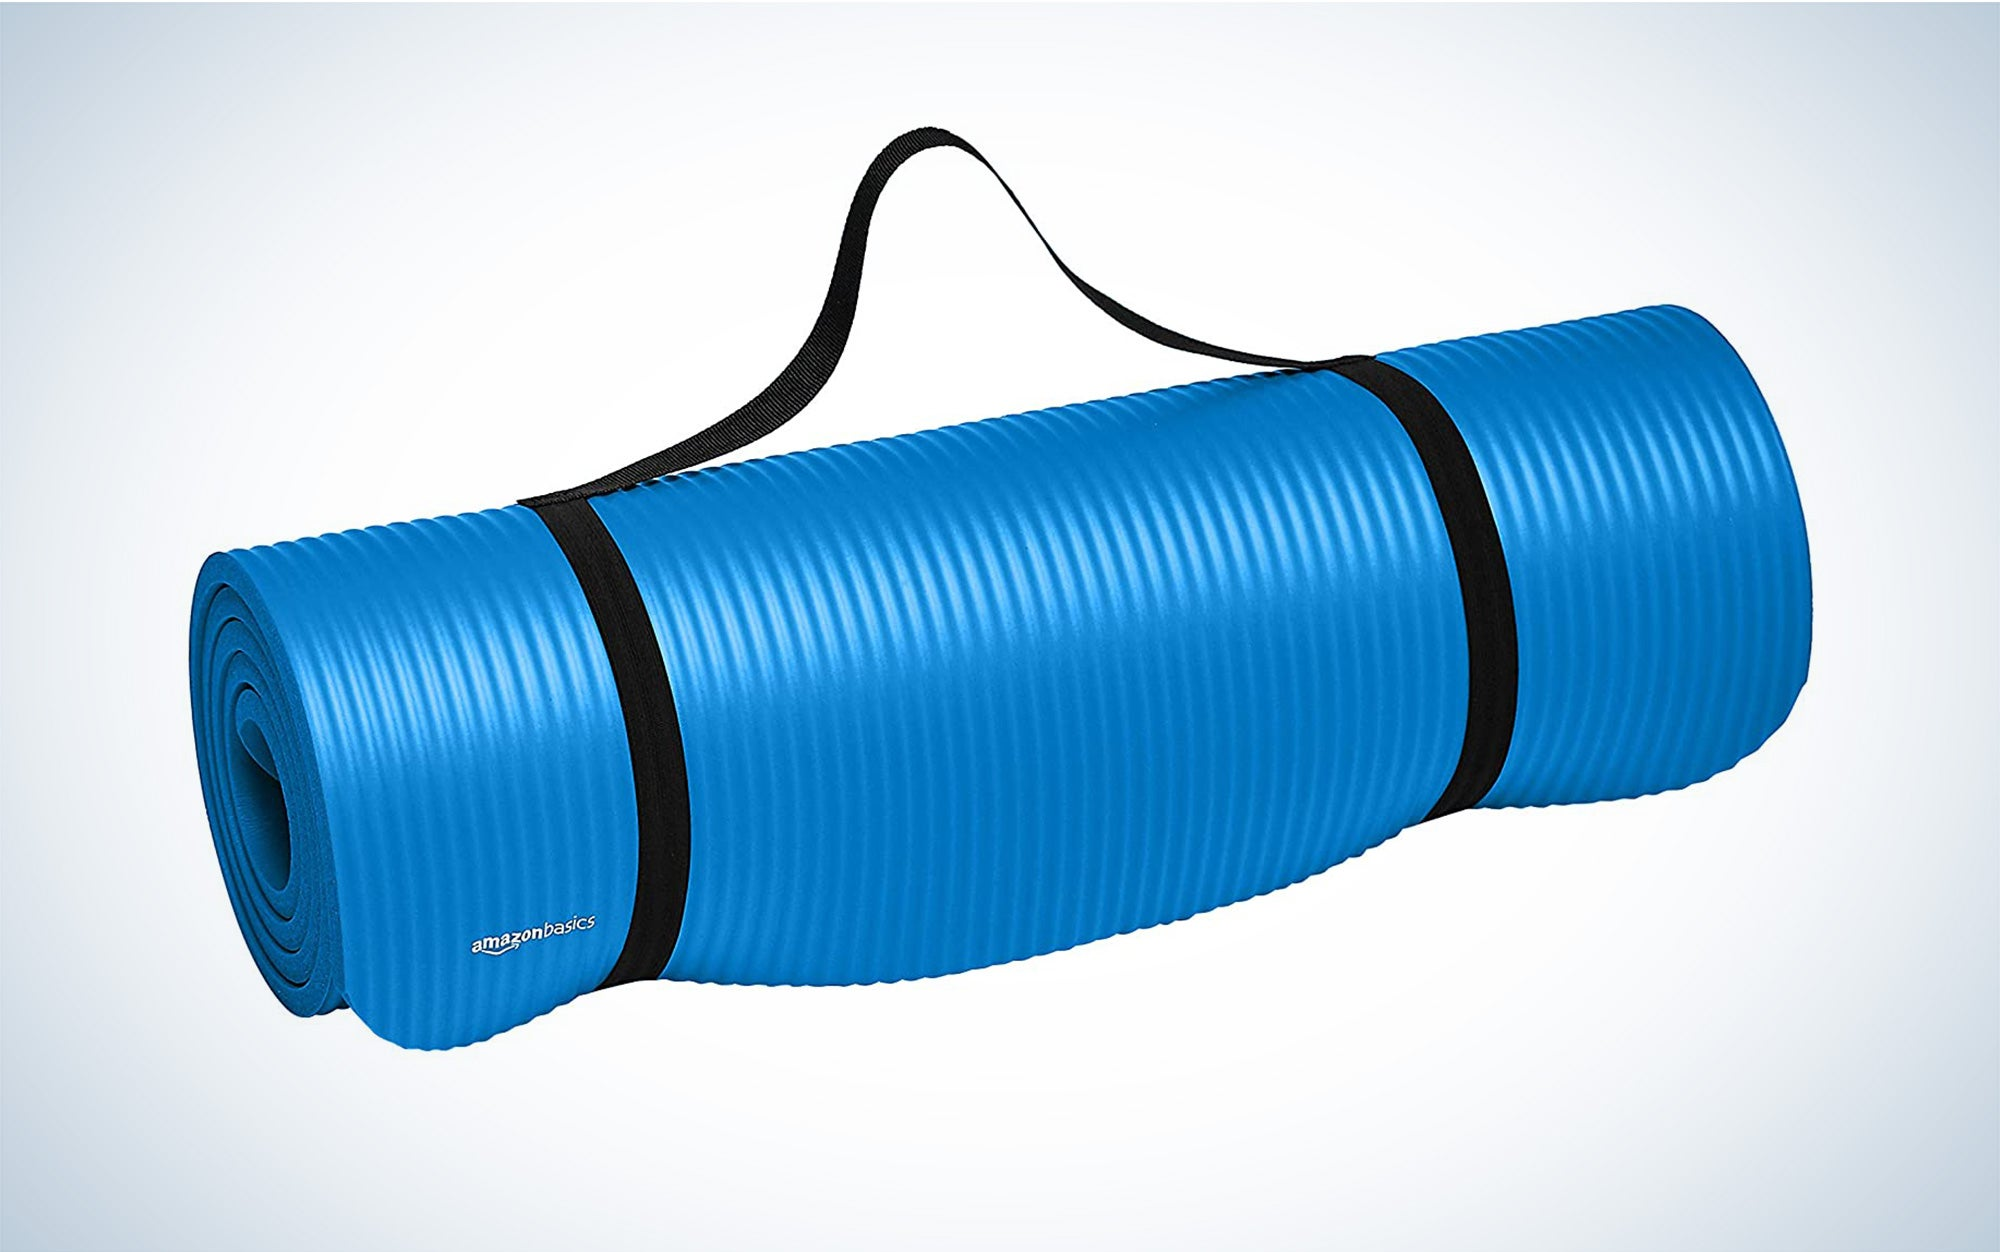 Amazon yoga mat